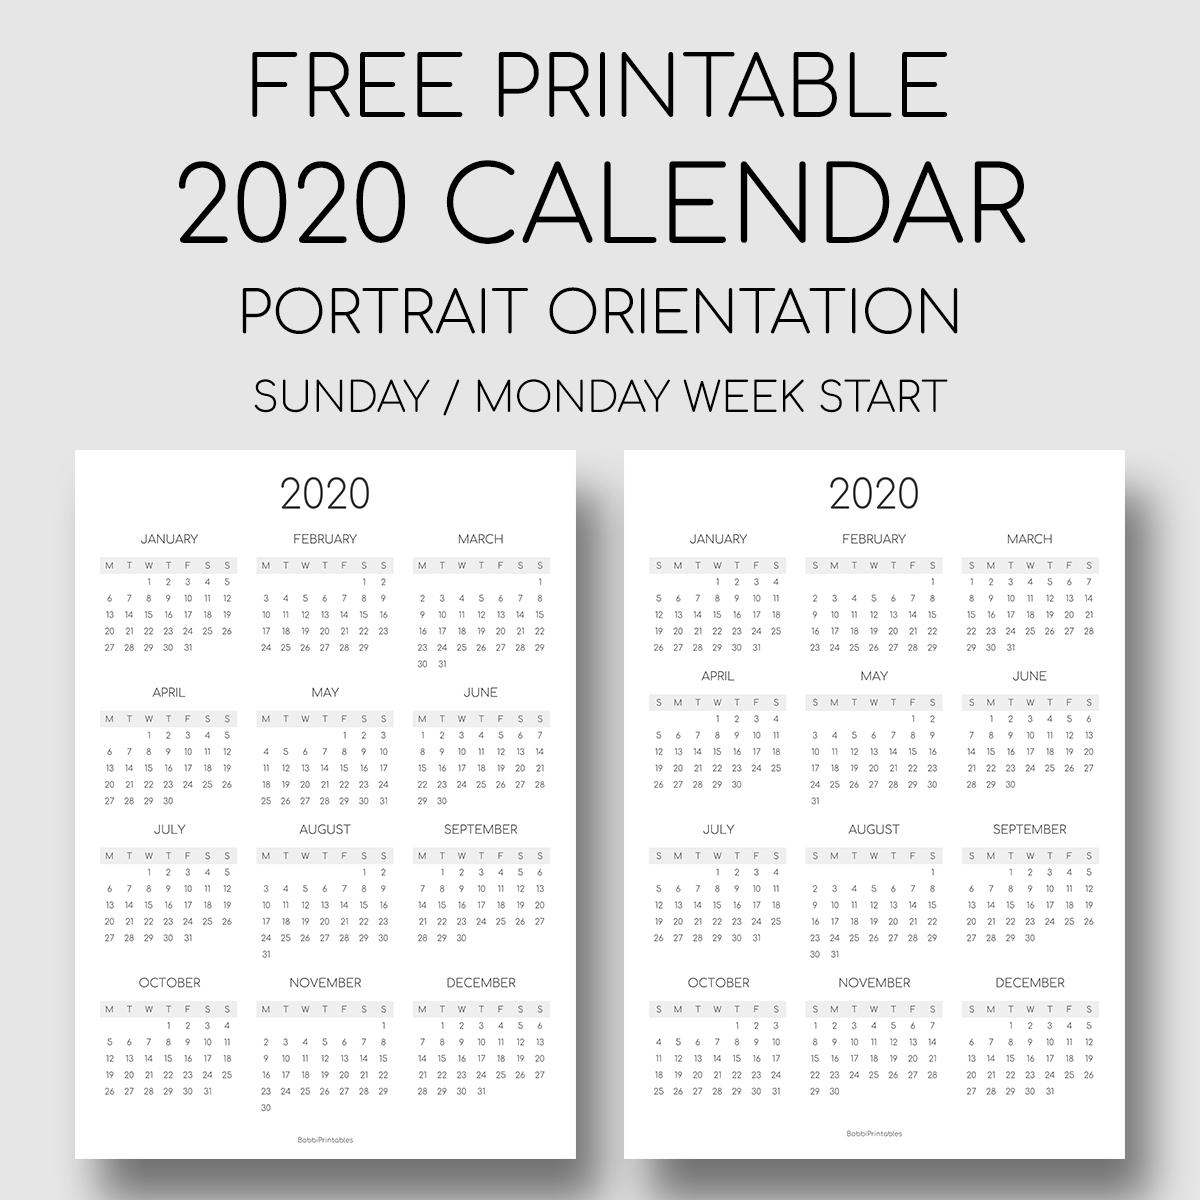 Printable 2020 Year At A Glance Calendar - Portrait Orientation Calendar Template Year At A Glance